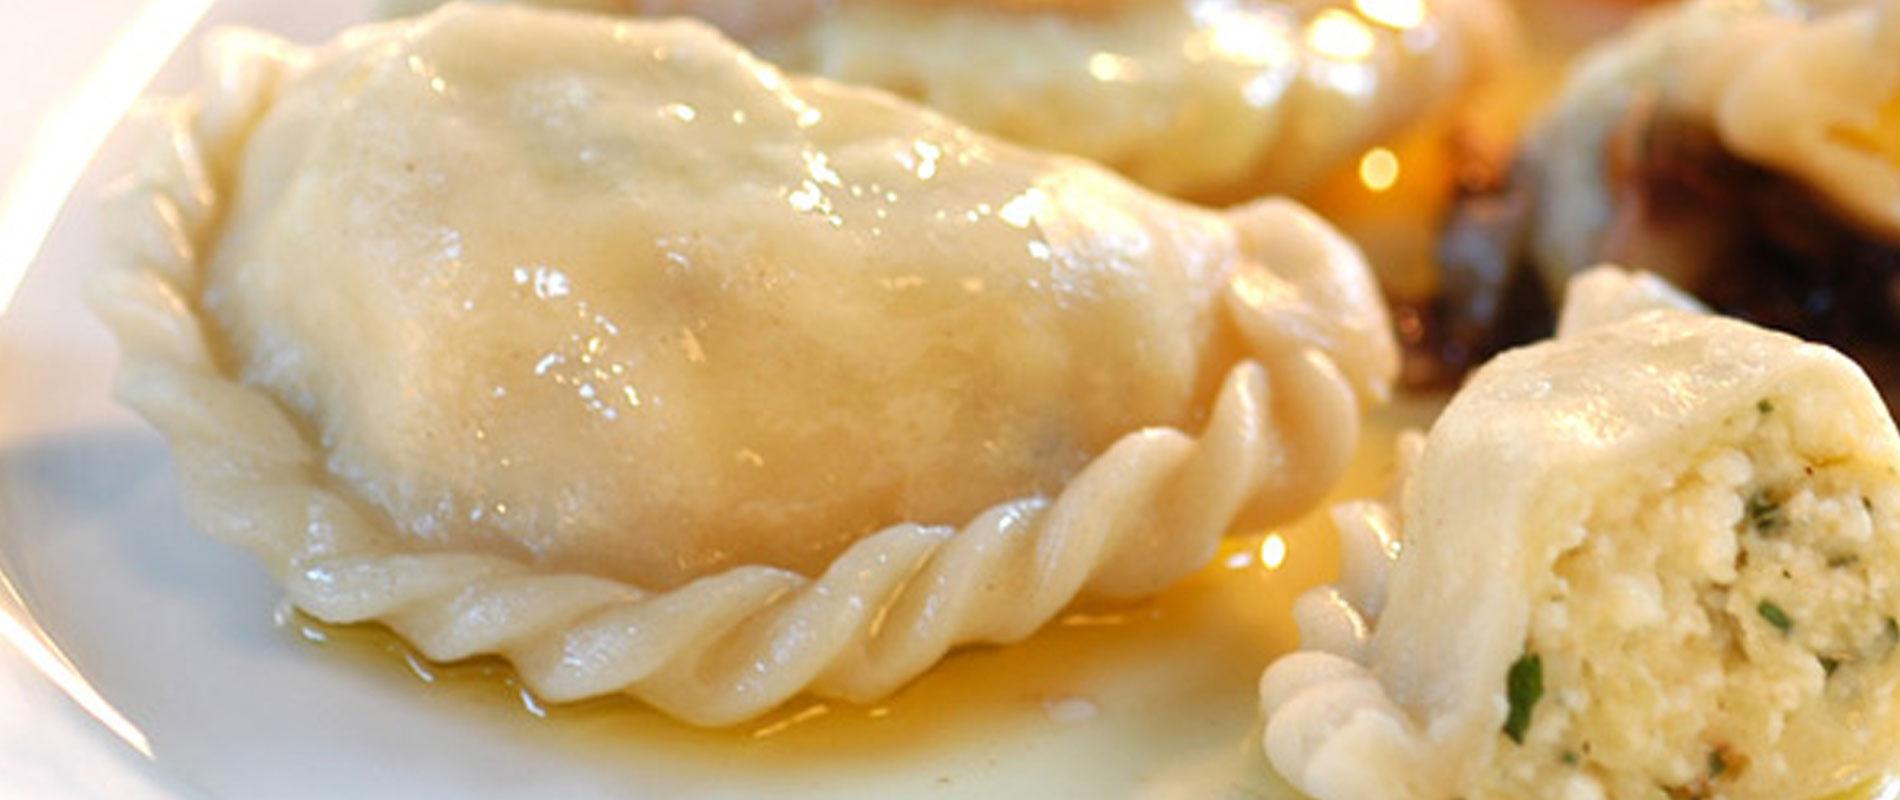 hausmannskost-hunger-kulinarik